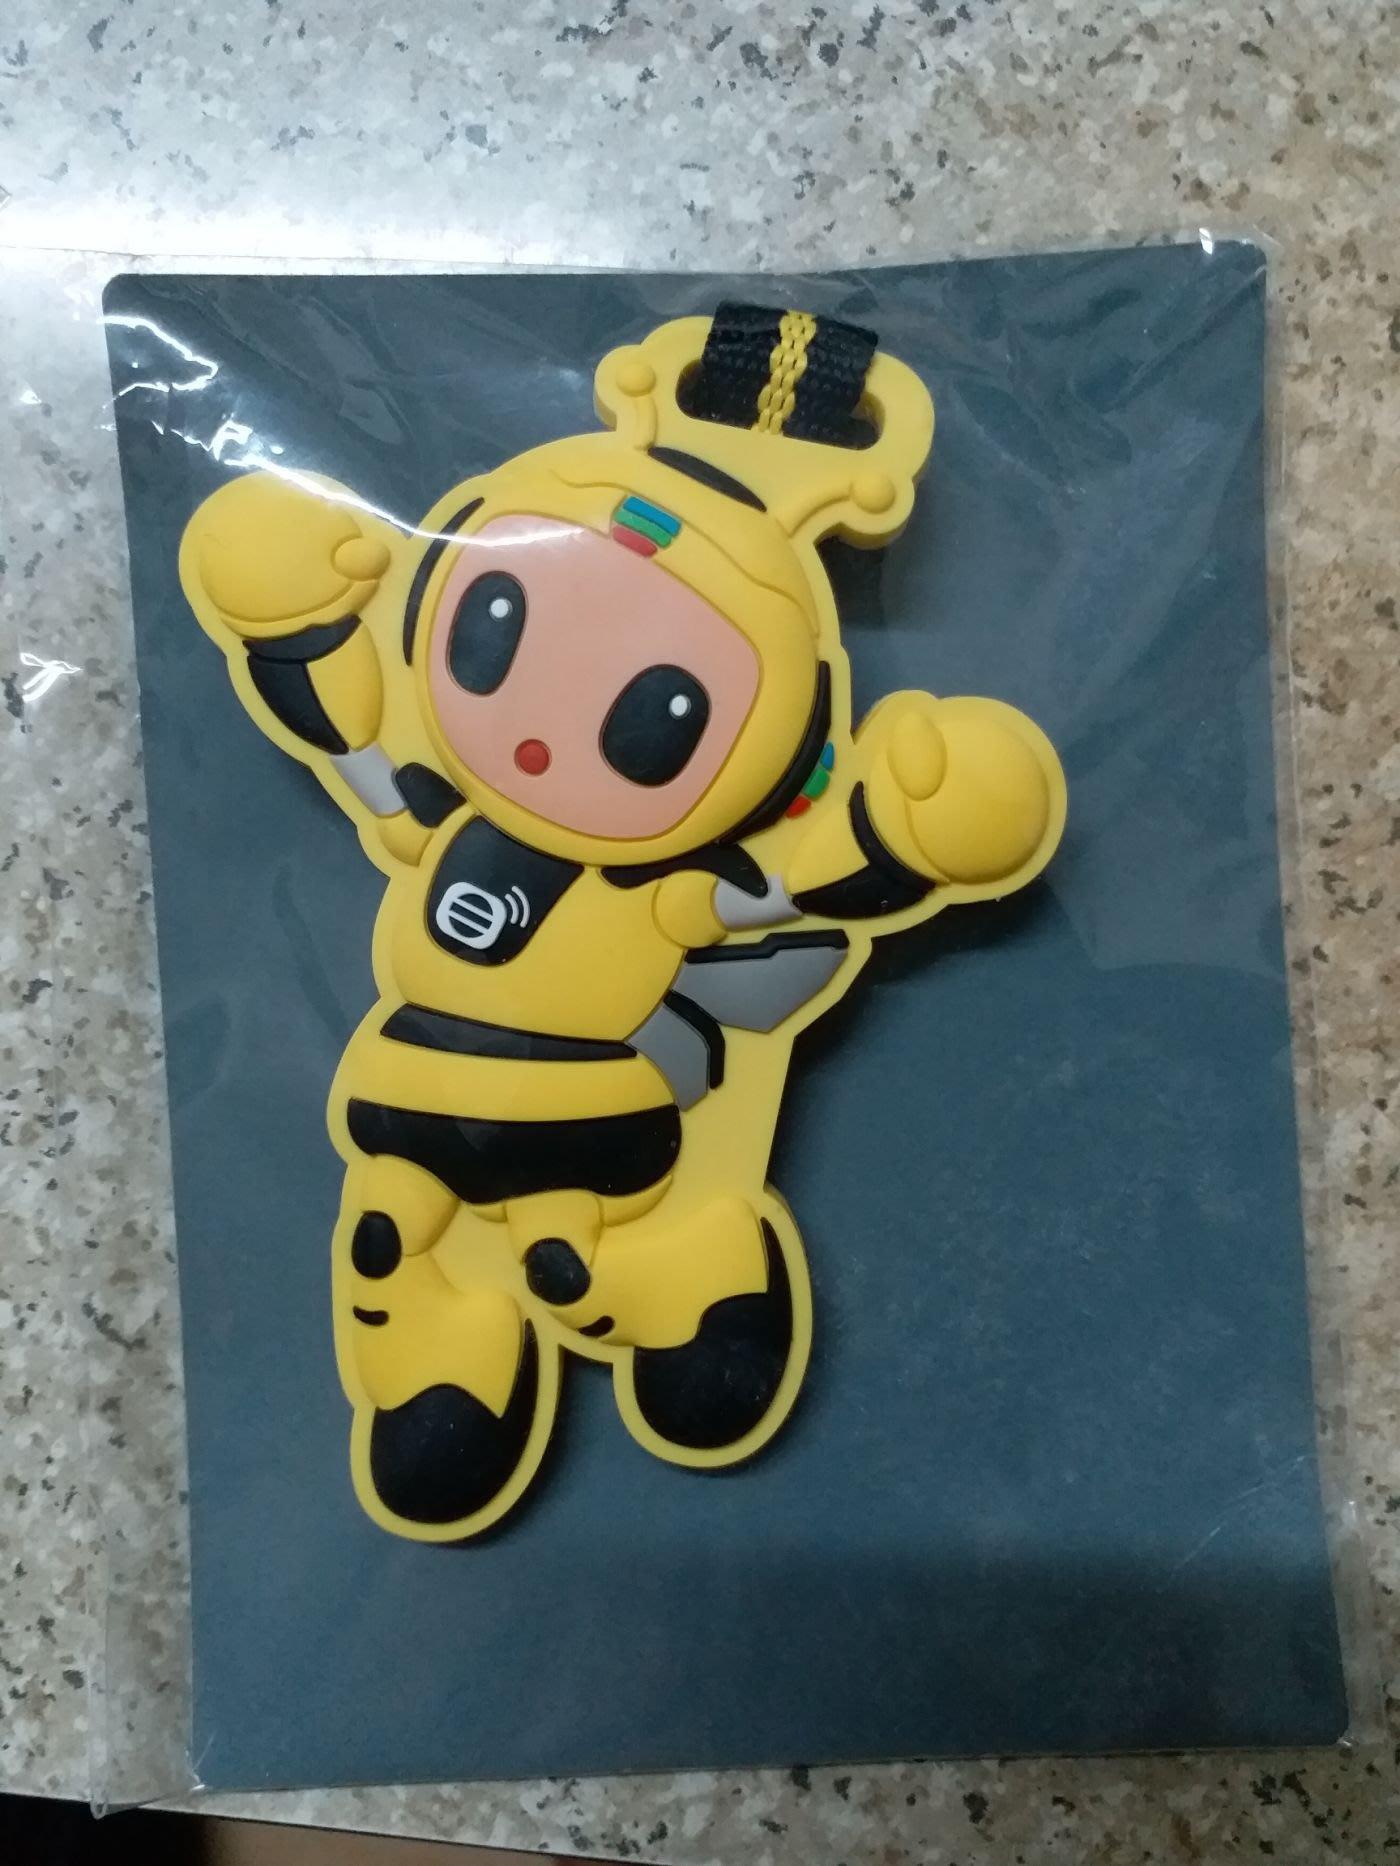 TVB 無線電視金禧紀念50周年tvb anywhere 吉祥物紀念行李牌蜜蜂